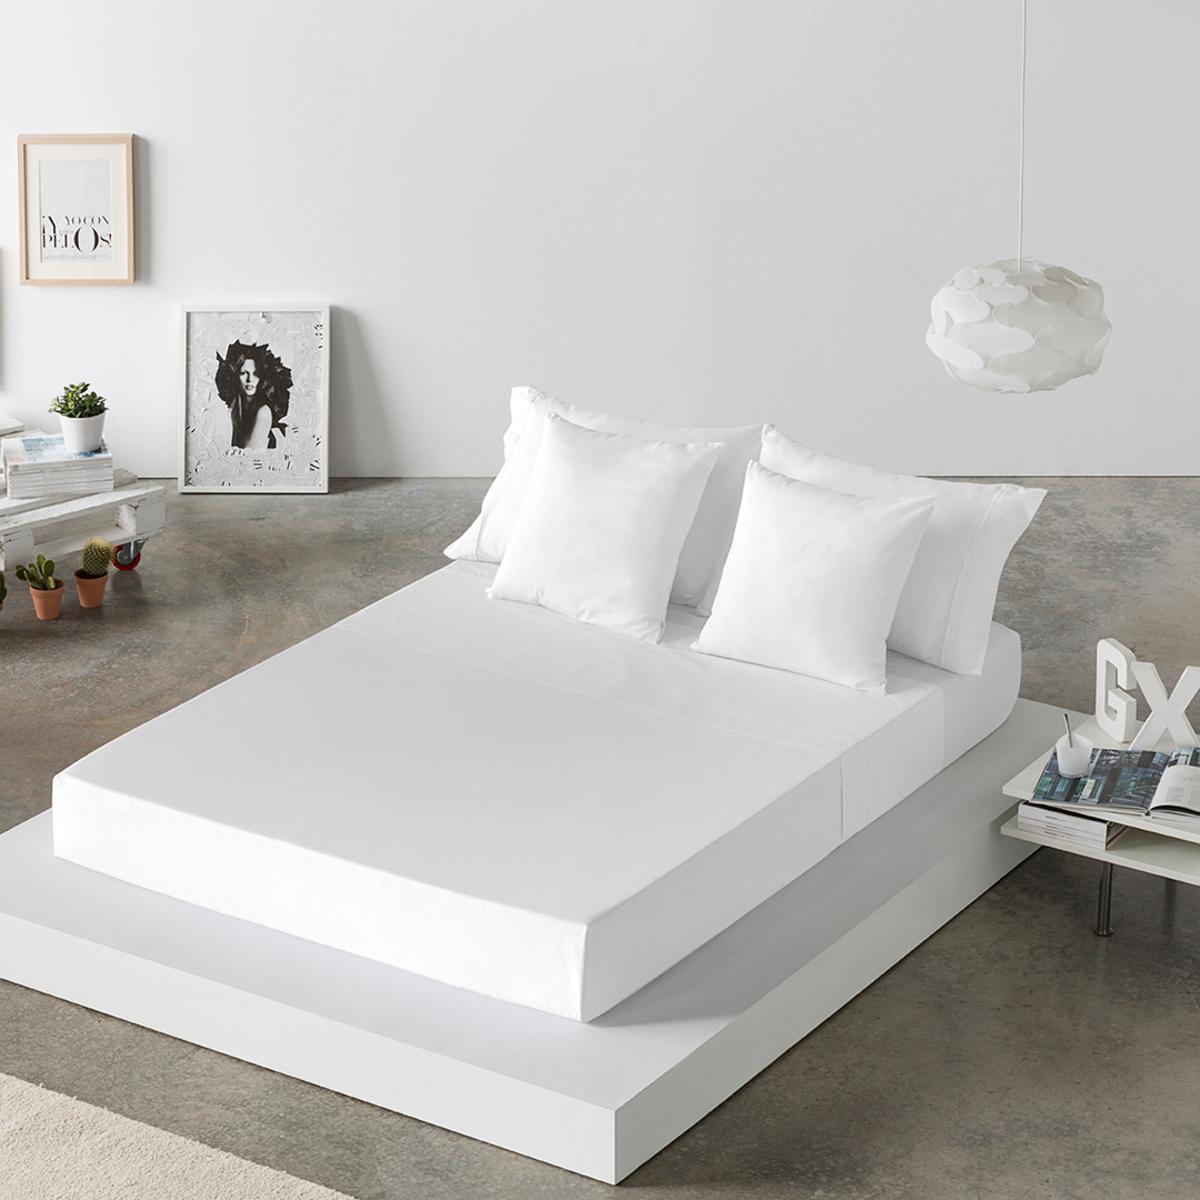 Drap de lit en coton blanc 160x280